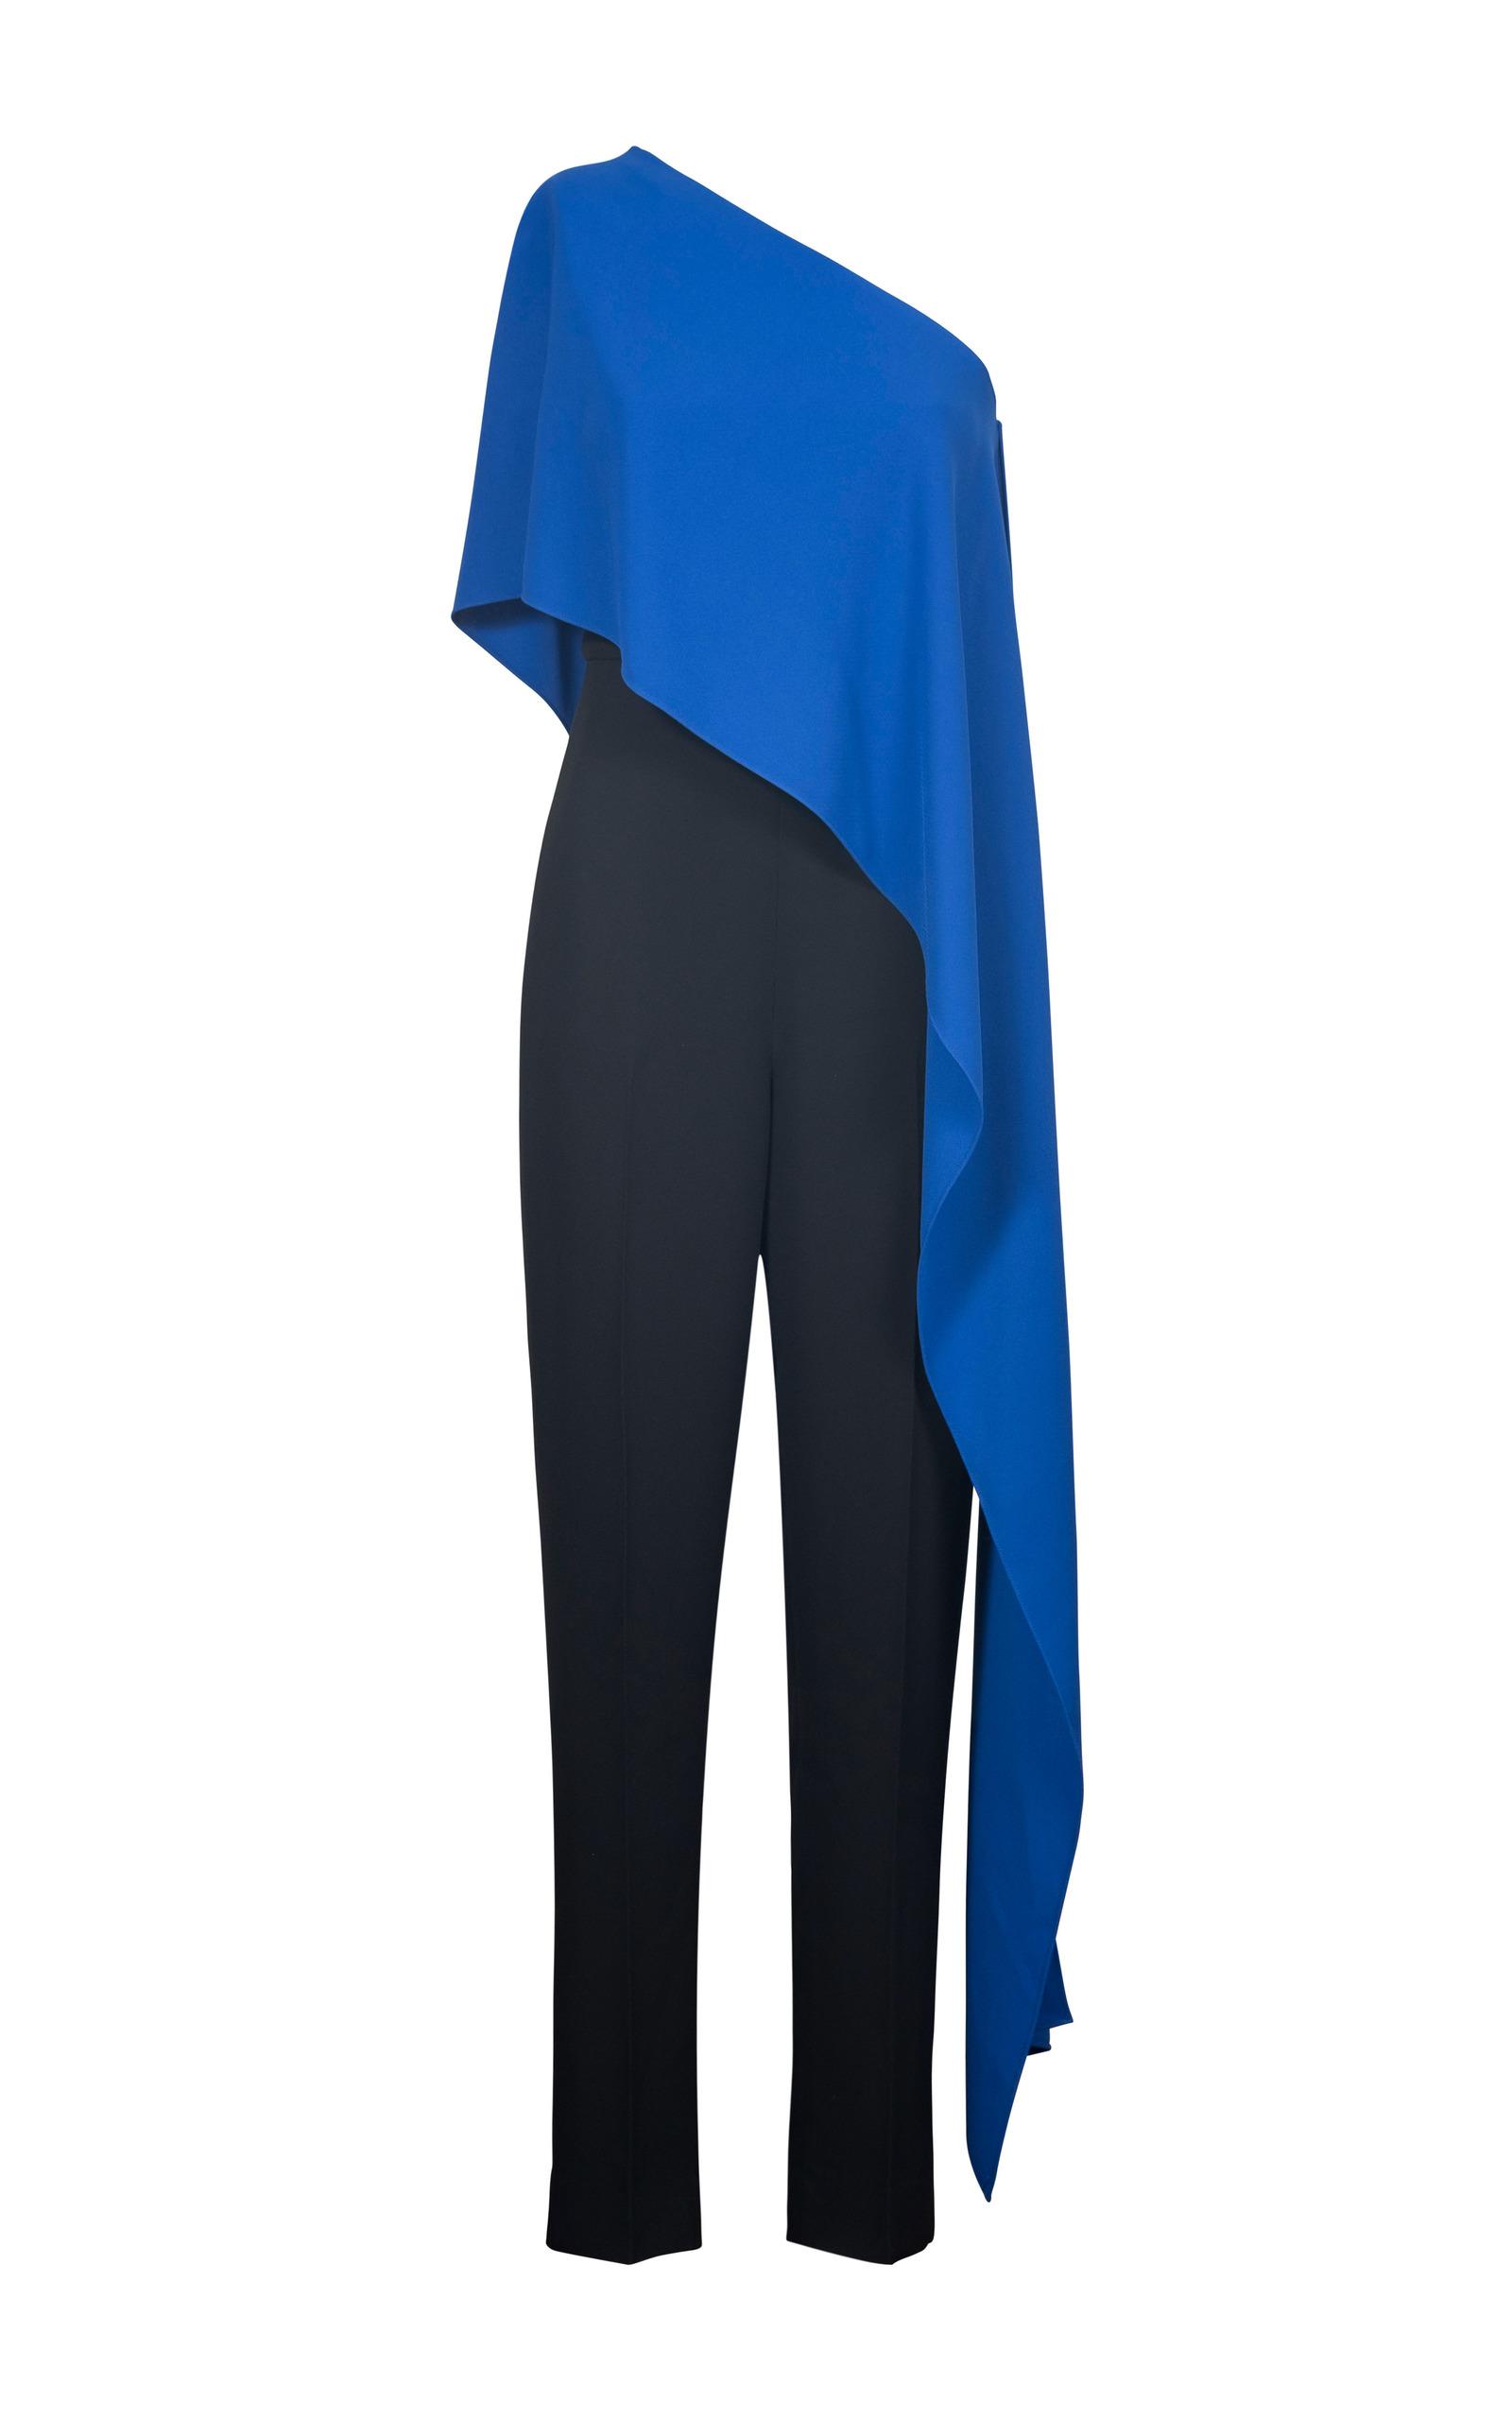 d3776fbb162 Carla ZampattiOver Lay Jumpsuit. CLOSE. Loading